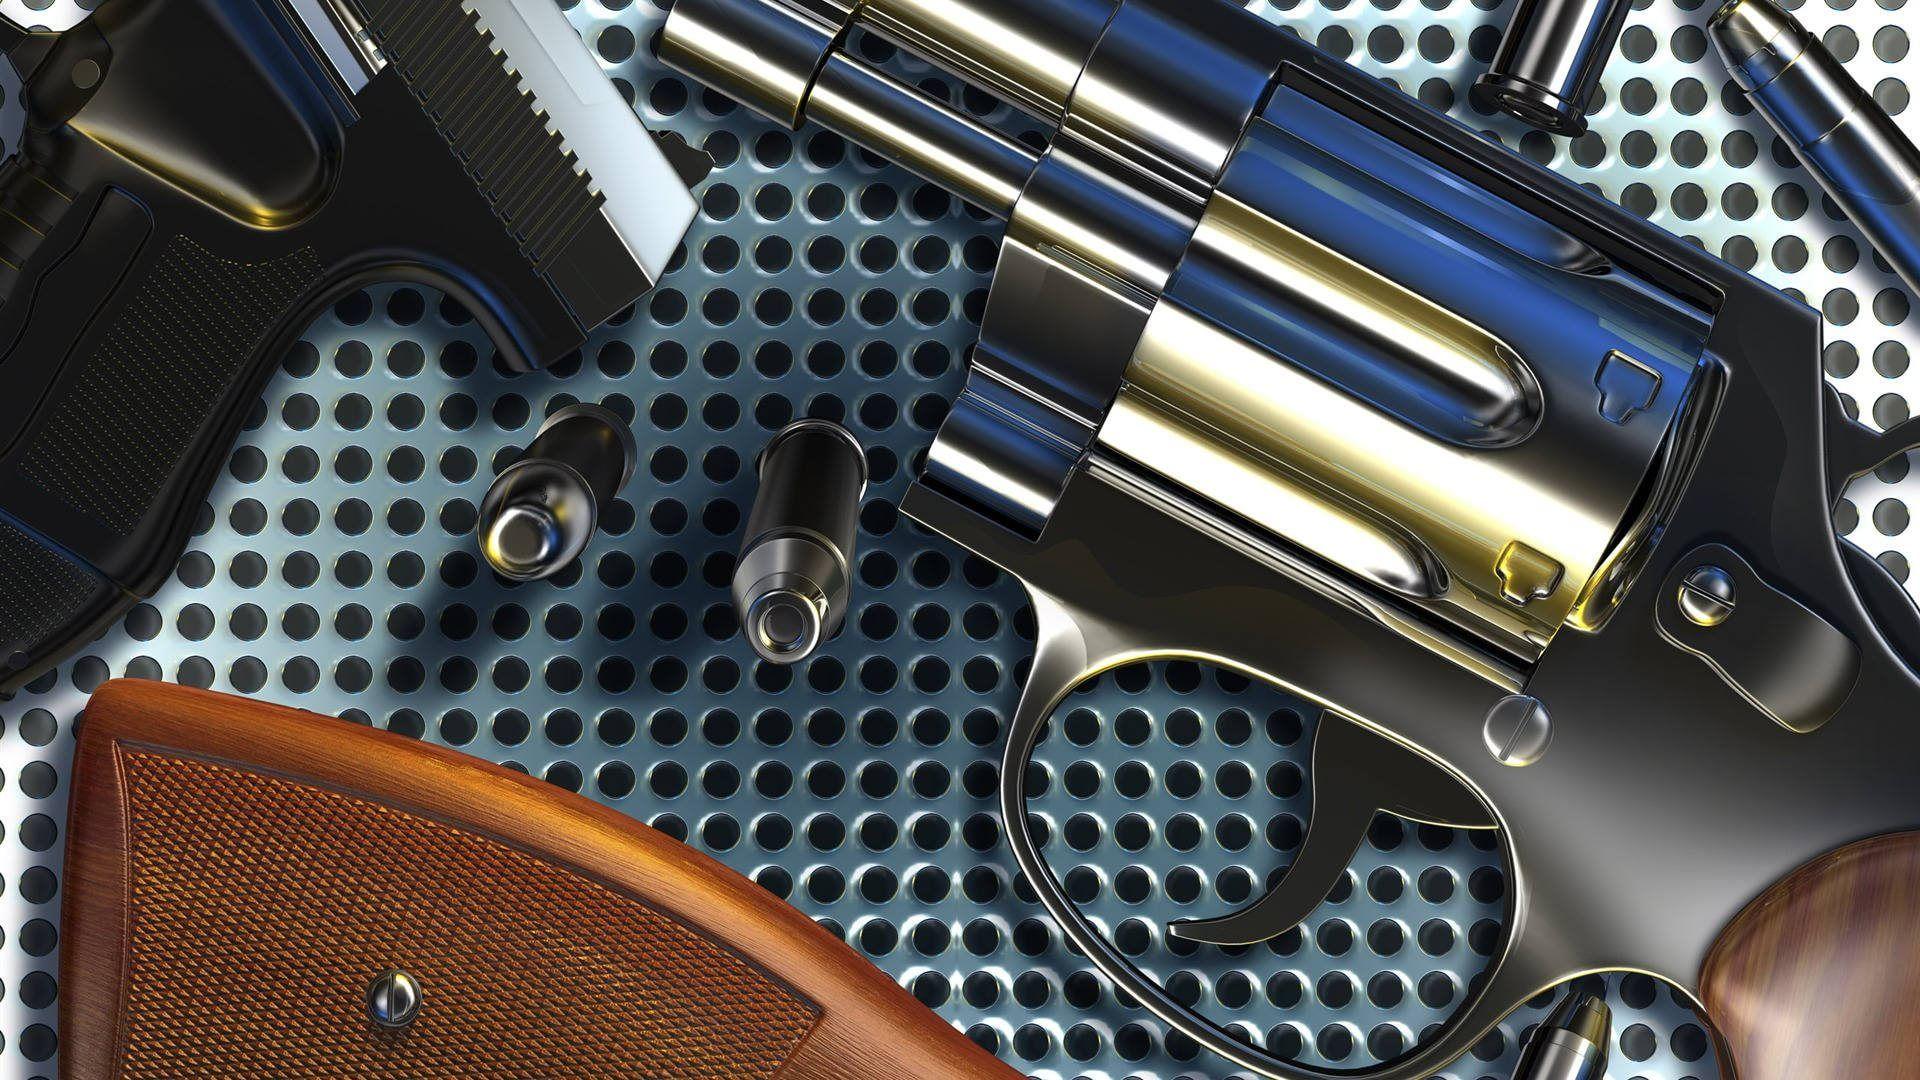 Gun For Desktop wallpaper picture hd